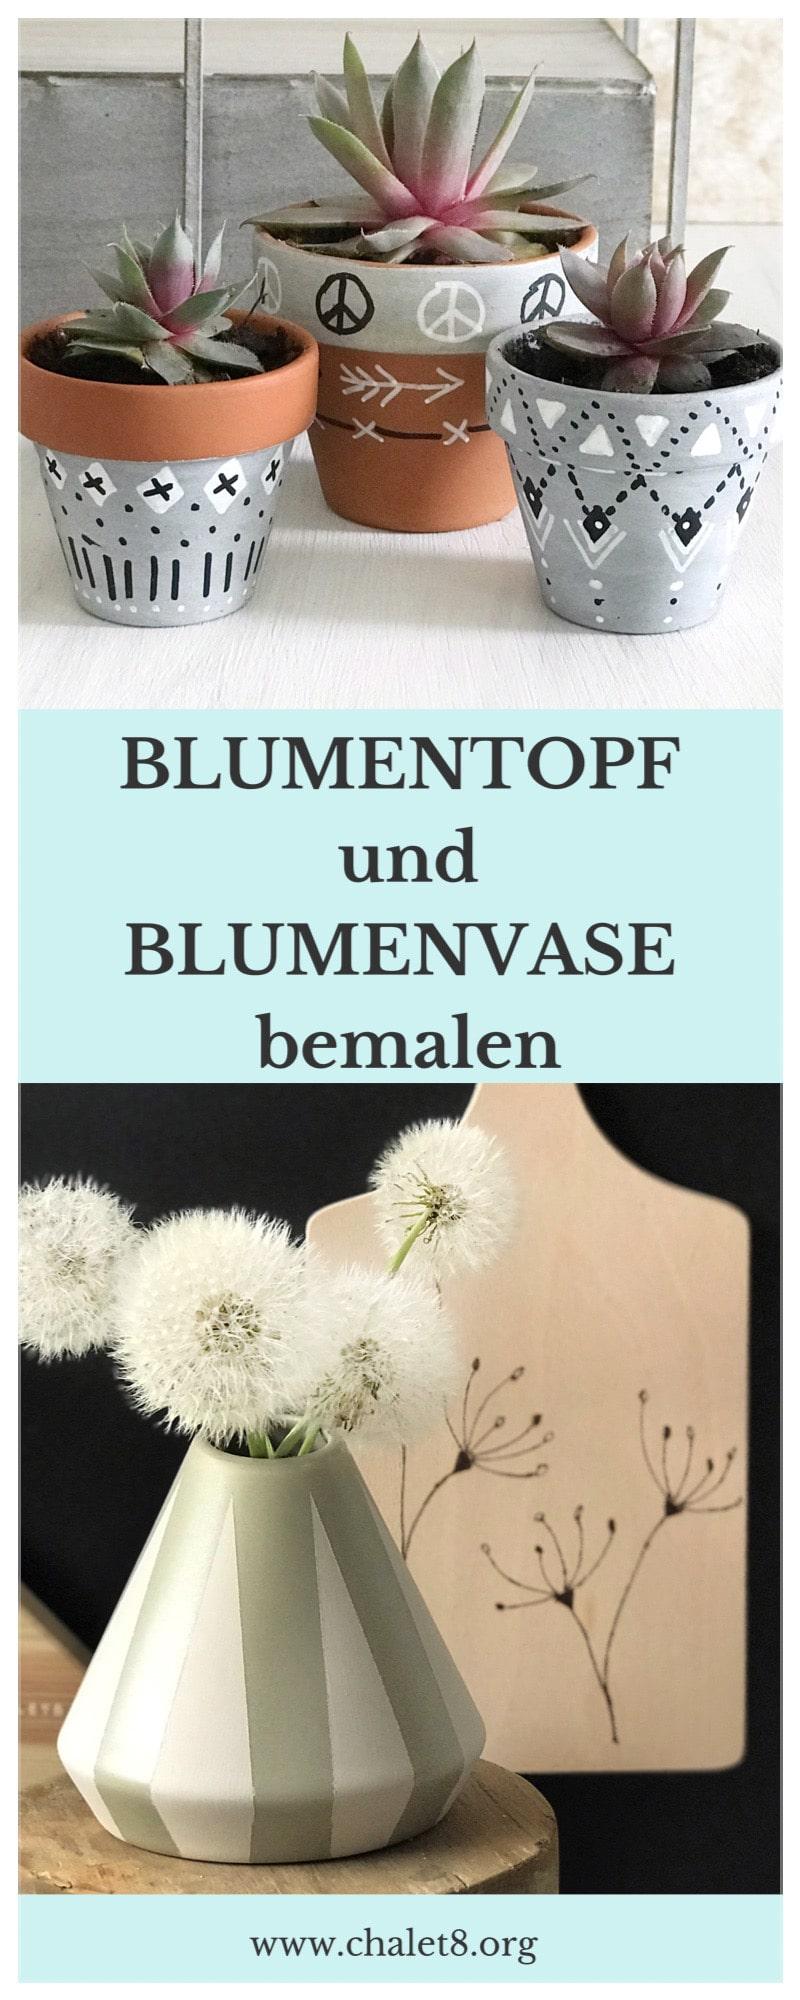 DIY: Blumentopf und Blumenvase bemalen in Scandi Boho Look. Blumentopf in Betonoptik. #chalet8 #Bohodeko #Blumentopfbemalen #DIYBlumenvase #DIYBoho #scandideko #diyscandi